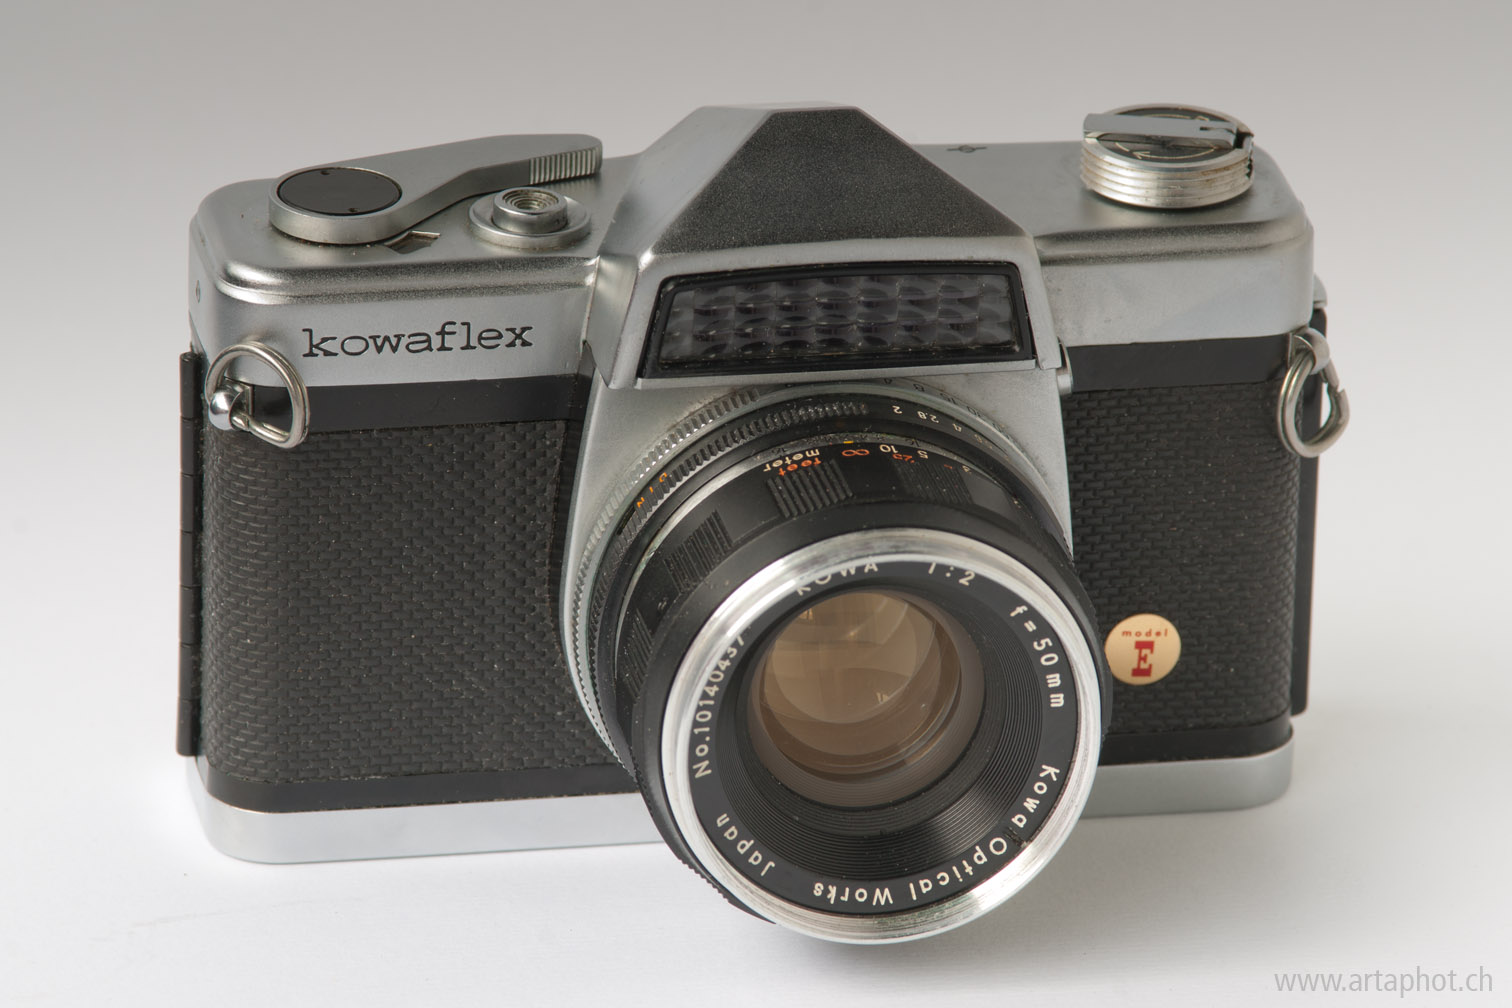 artaphot Kowaflex E DSC00199